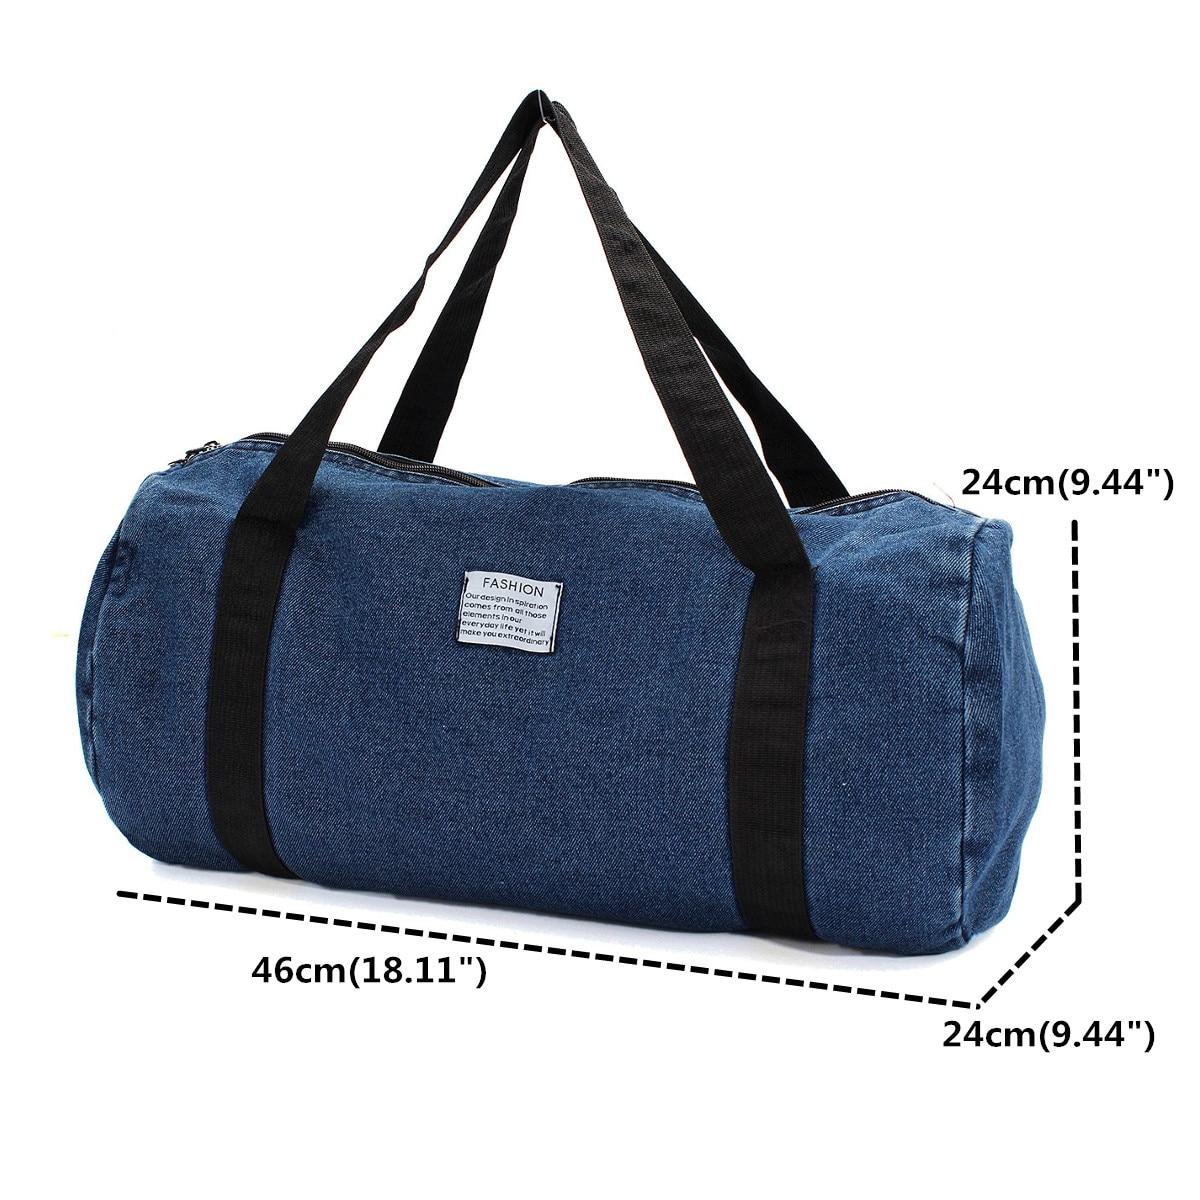 3c647da153ba Outdoor Sport Gym Bag Travel Duffel Denim Jean Cloth Sport Bags ...